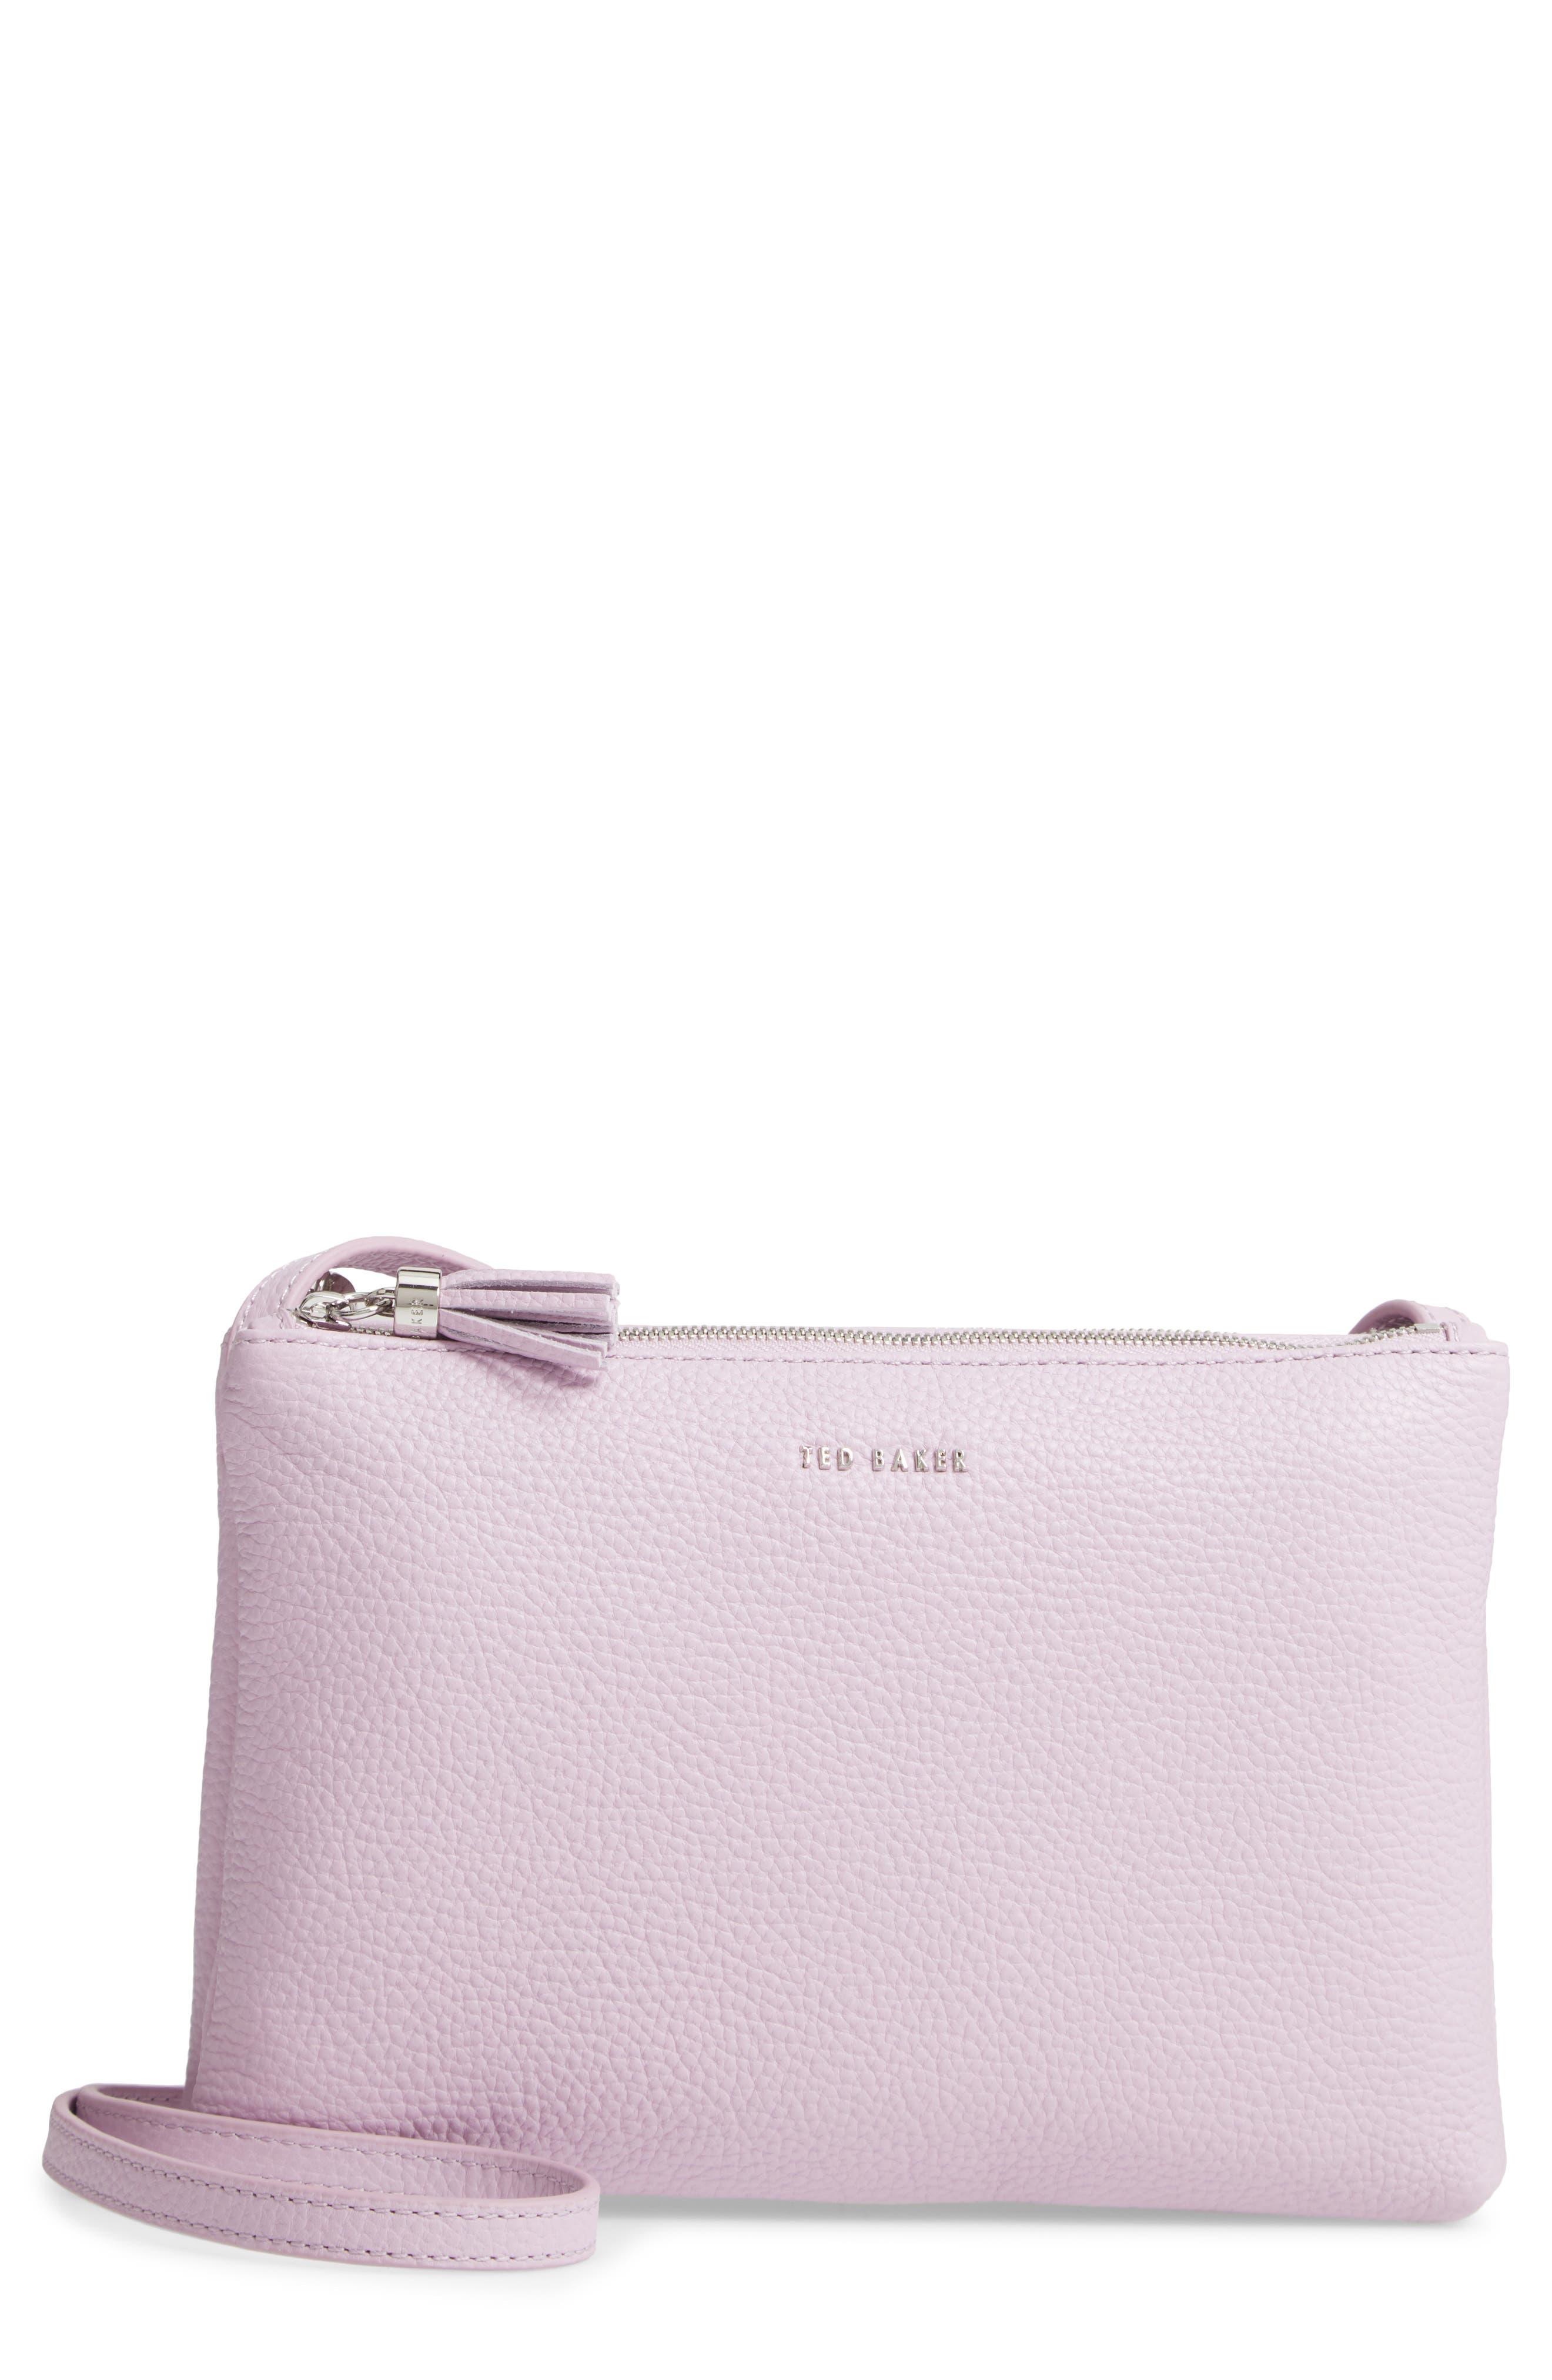 7fd58e6a45 Ted Baker London Handbags   Wallets for Women